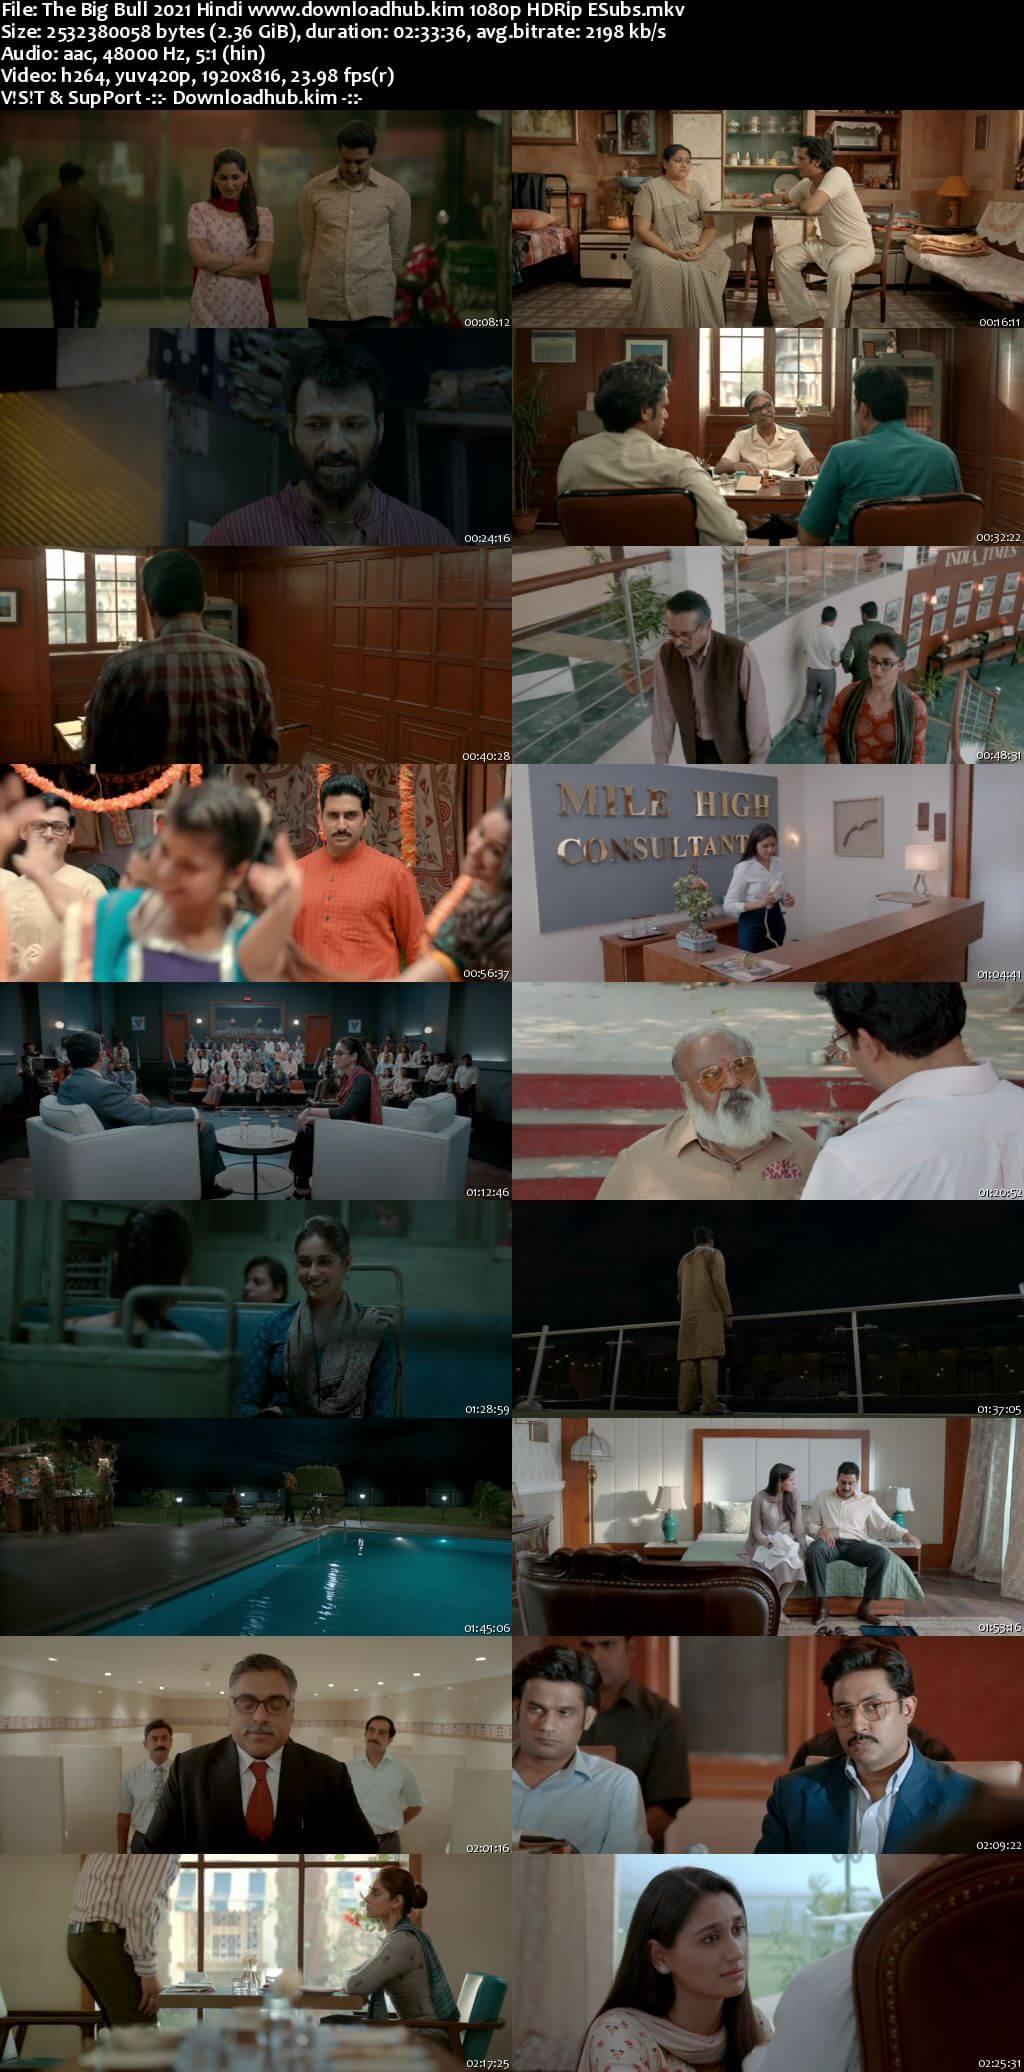 The Big Bull 2021 Hindi 1080p HDRip ESubs